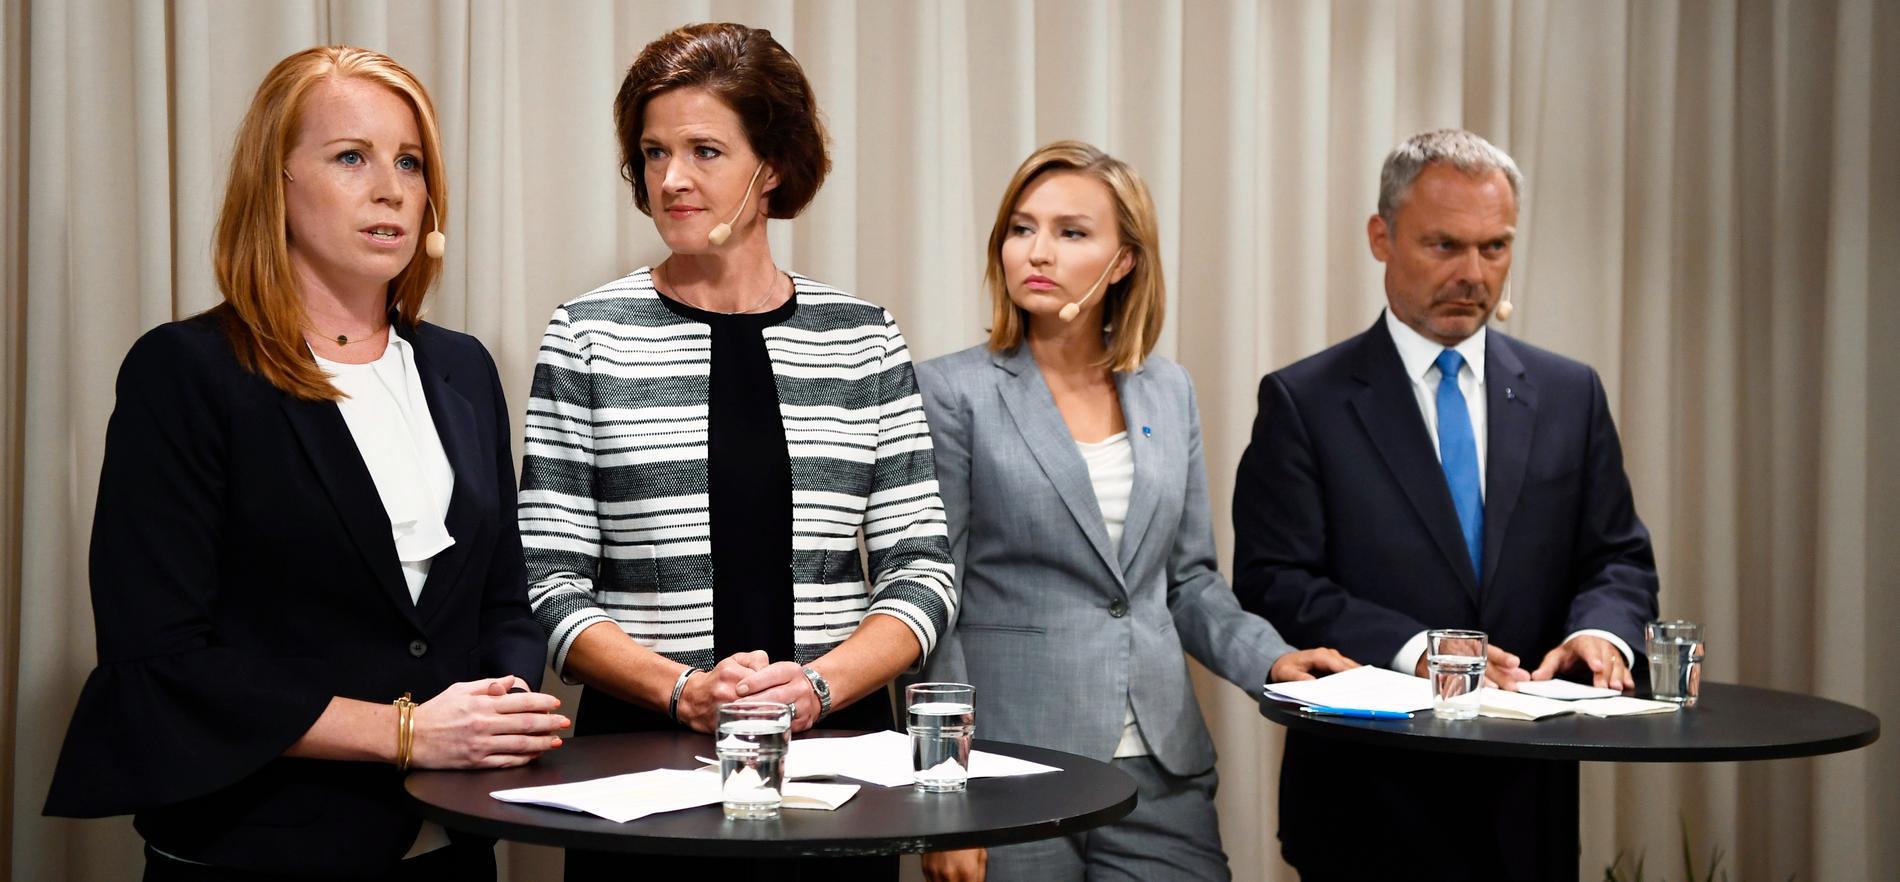 Annie Lööf, Anna Kindberg Batra, Ebba Busch Thor och Jan Björklund.